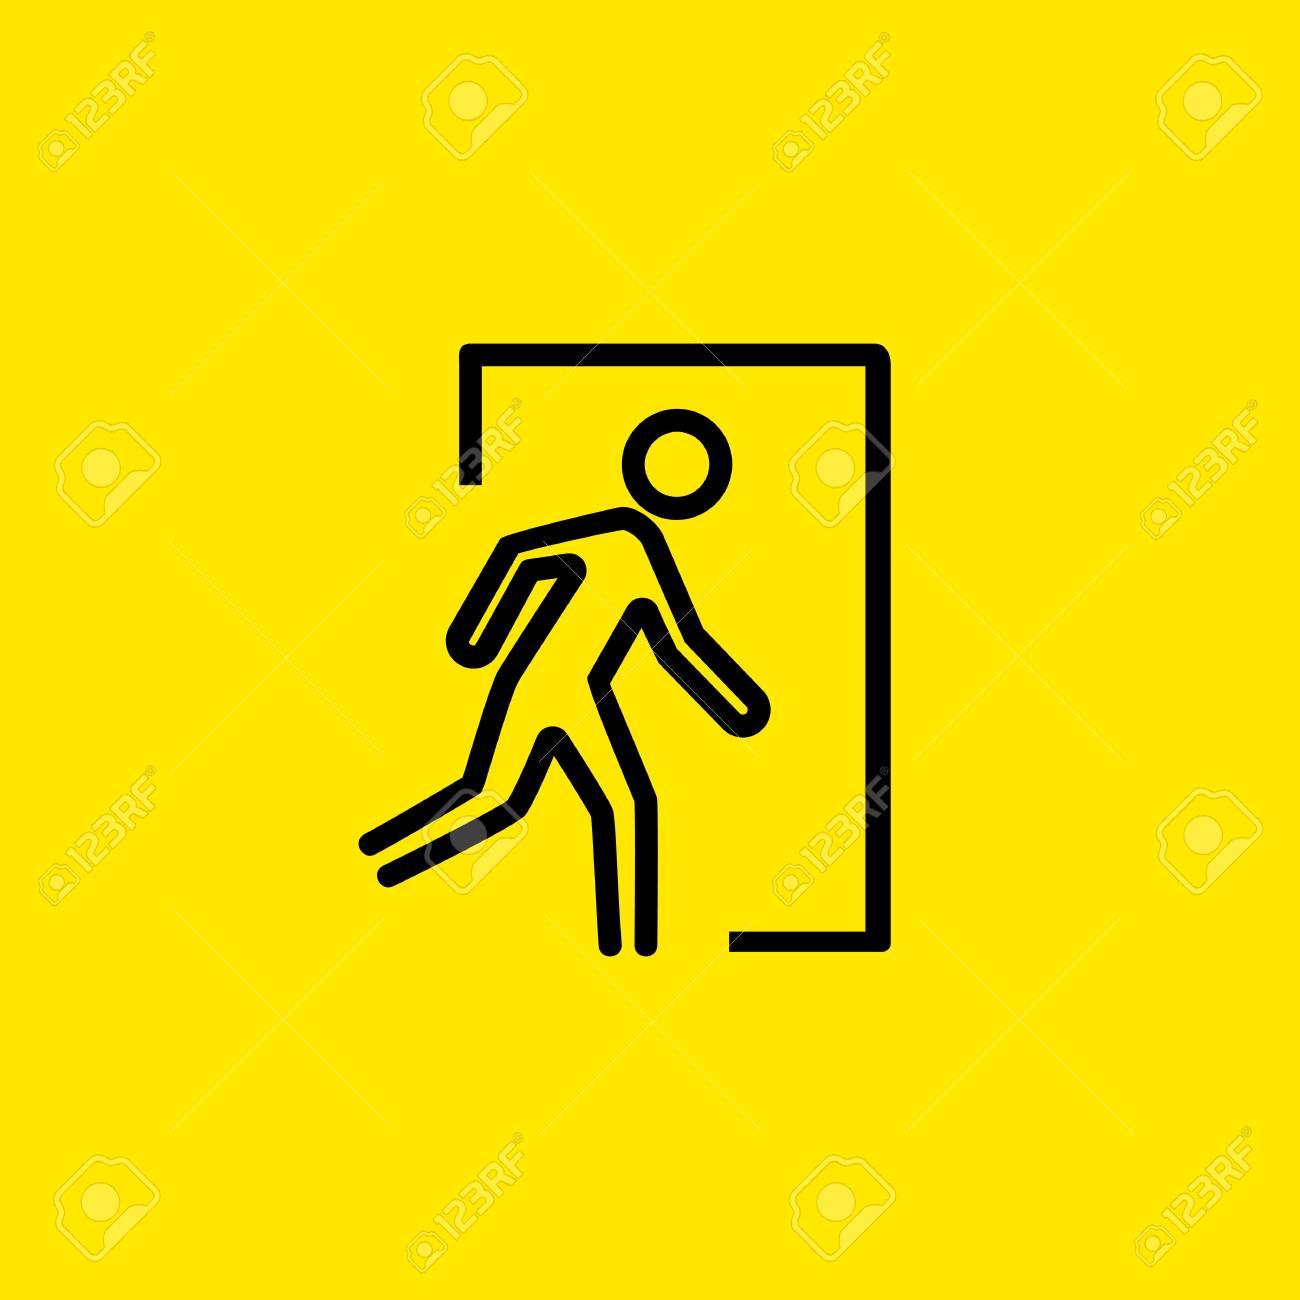 Emergency Exit Icon Illustration On Yellow Background Royalty 1300x1300